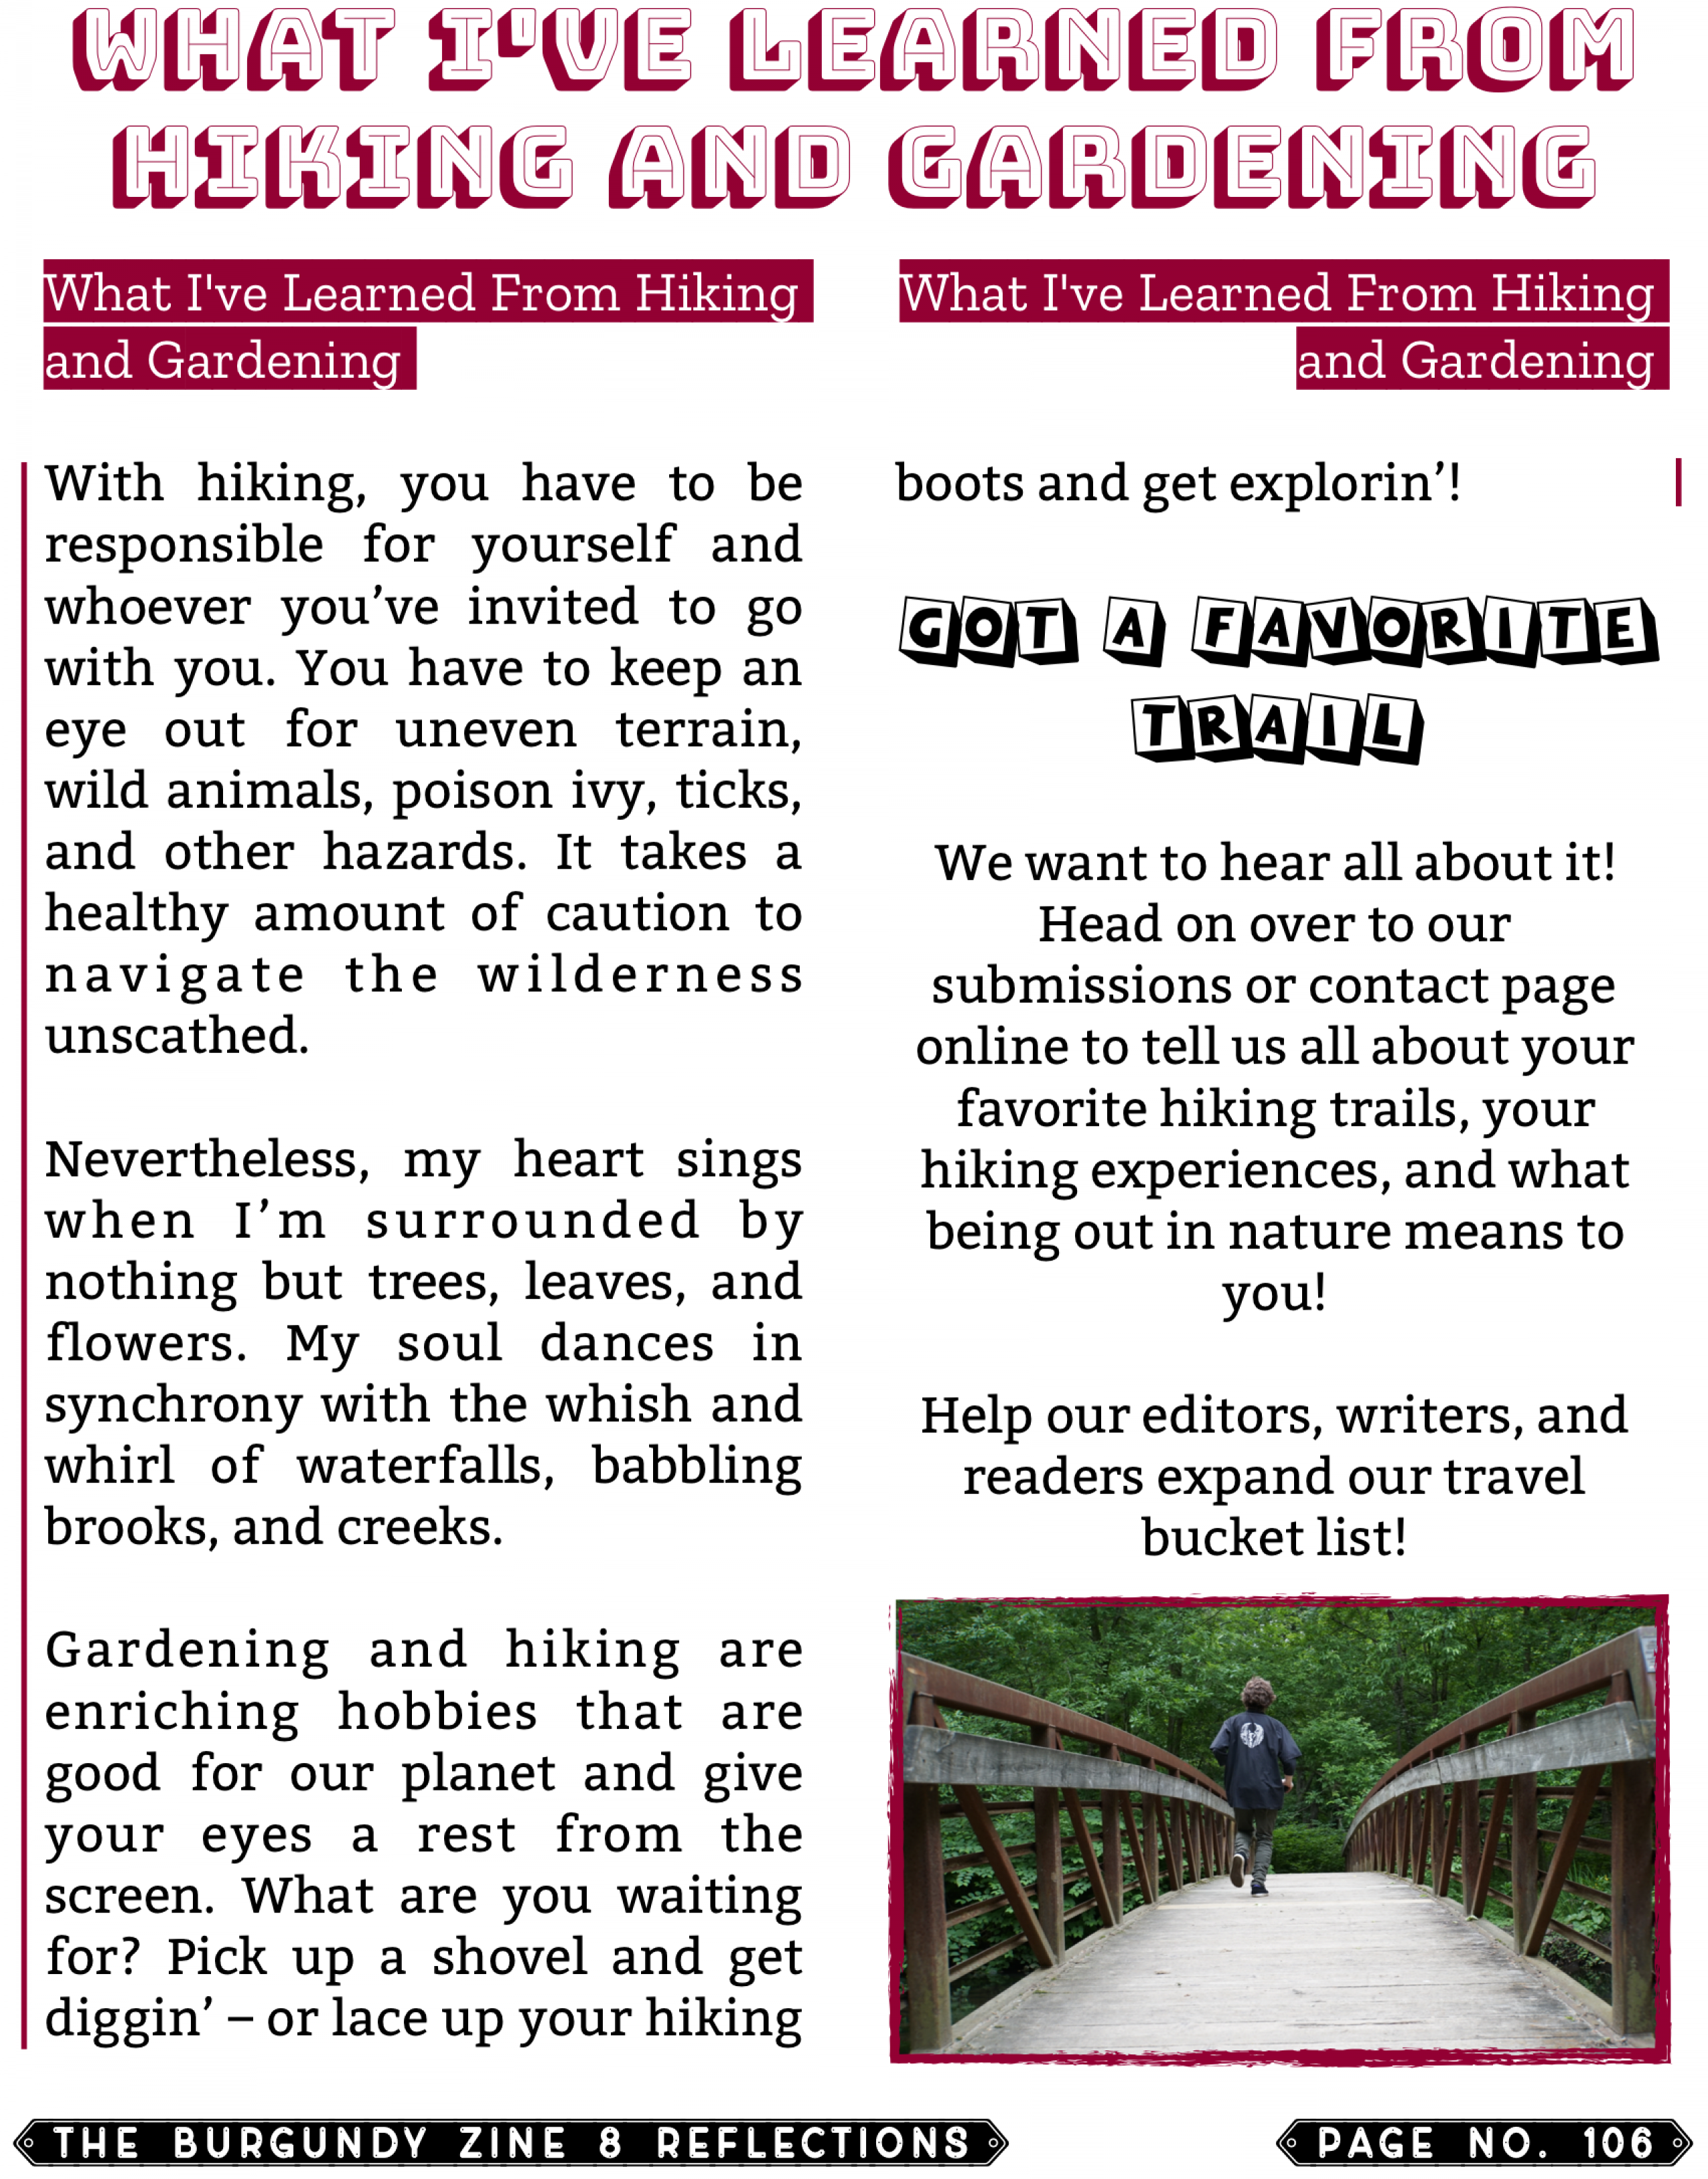 The Burgundy Zine #8 Reflections 106